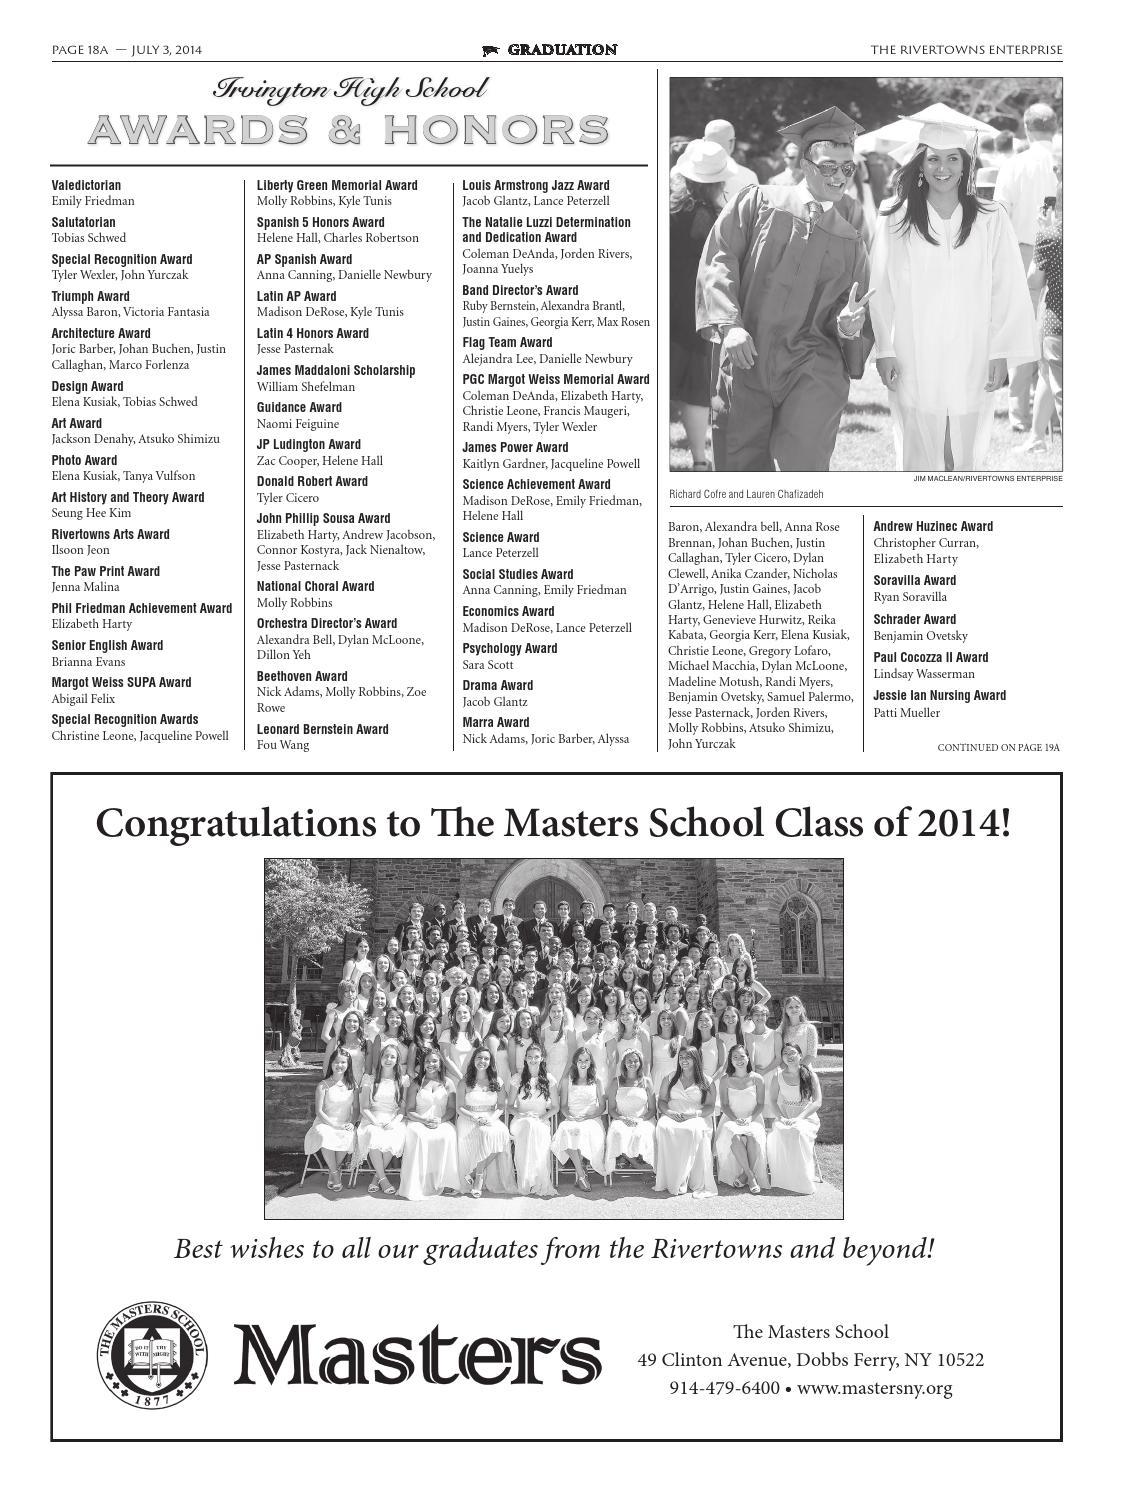 Rivertowns Enterprise Graduation 2014 by The Rivertowns